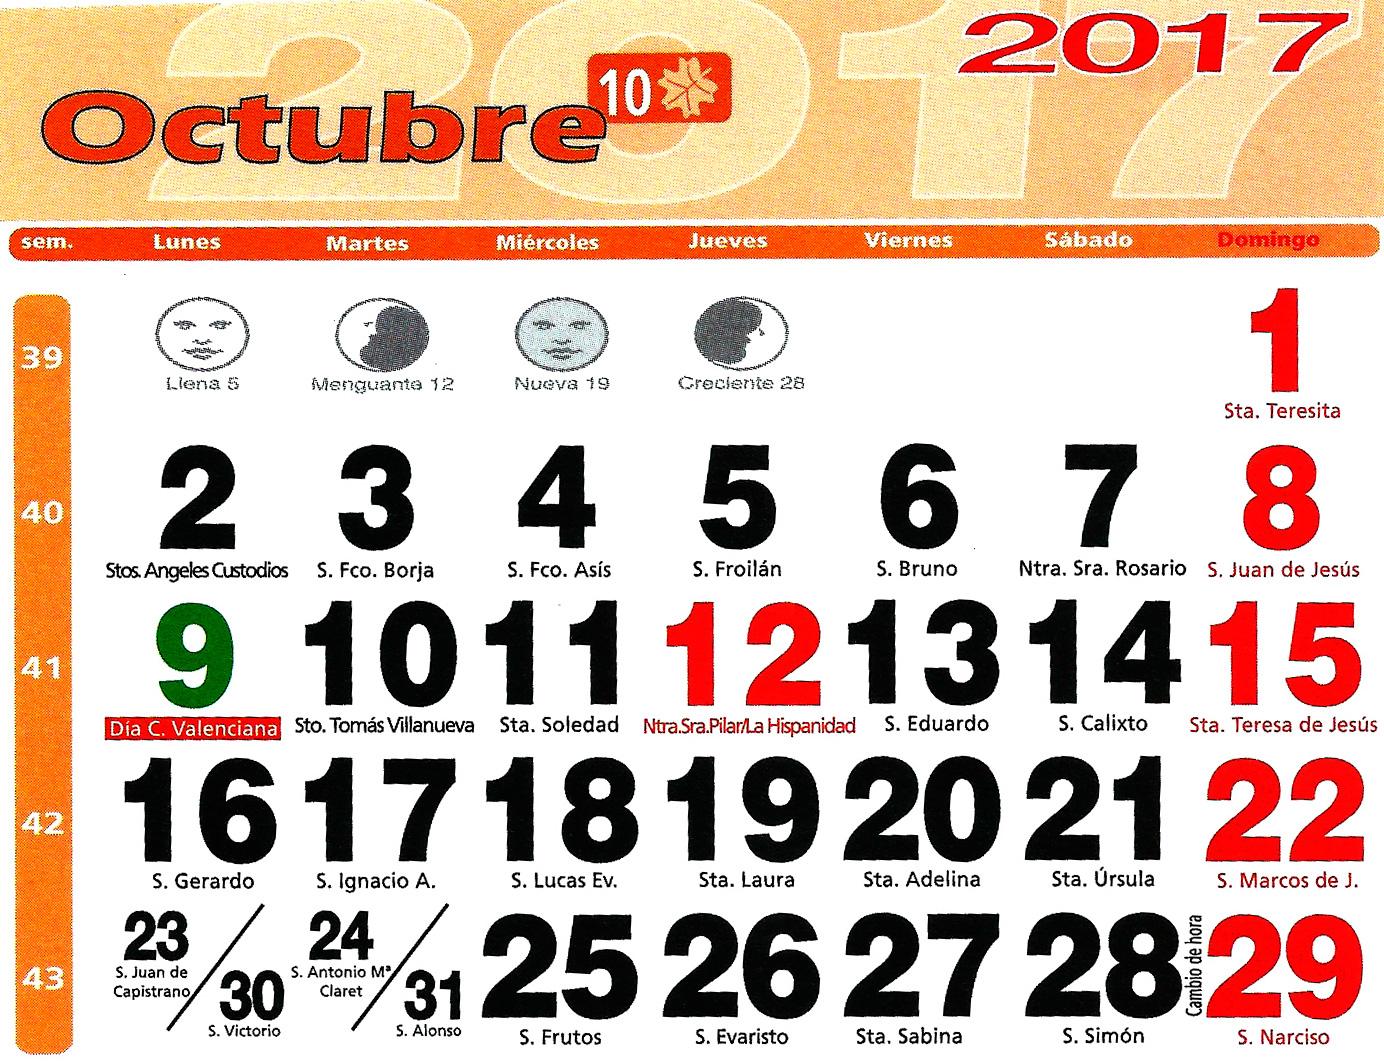 Huerto urbano luis servia borgas calendario lunar 2017 for Calendario lunar de octubre 2016